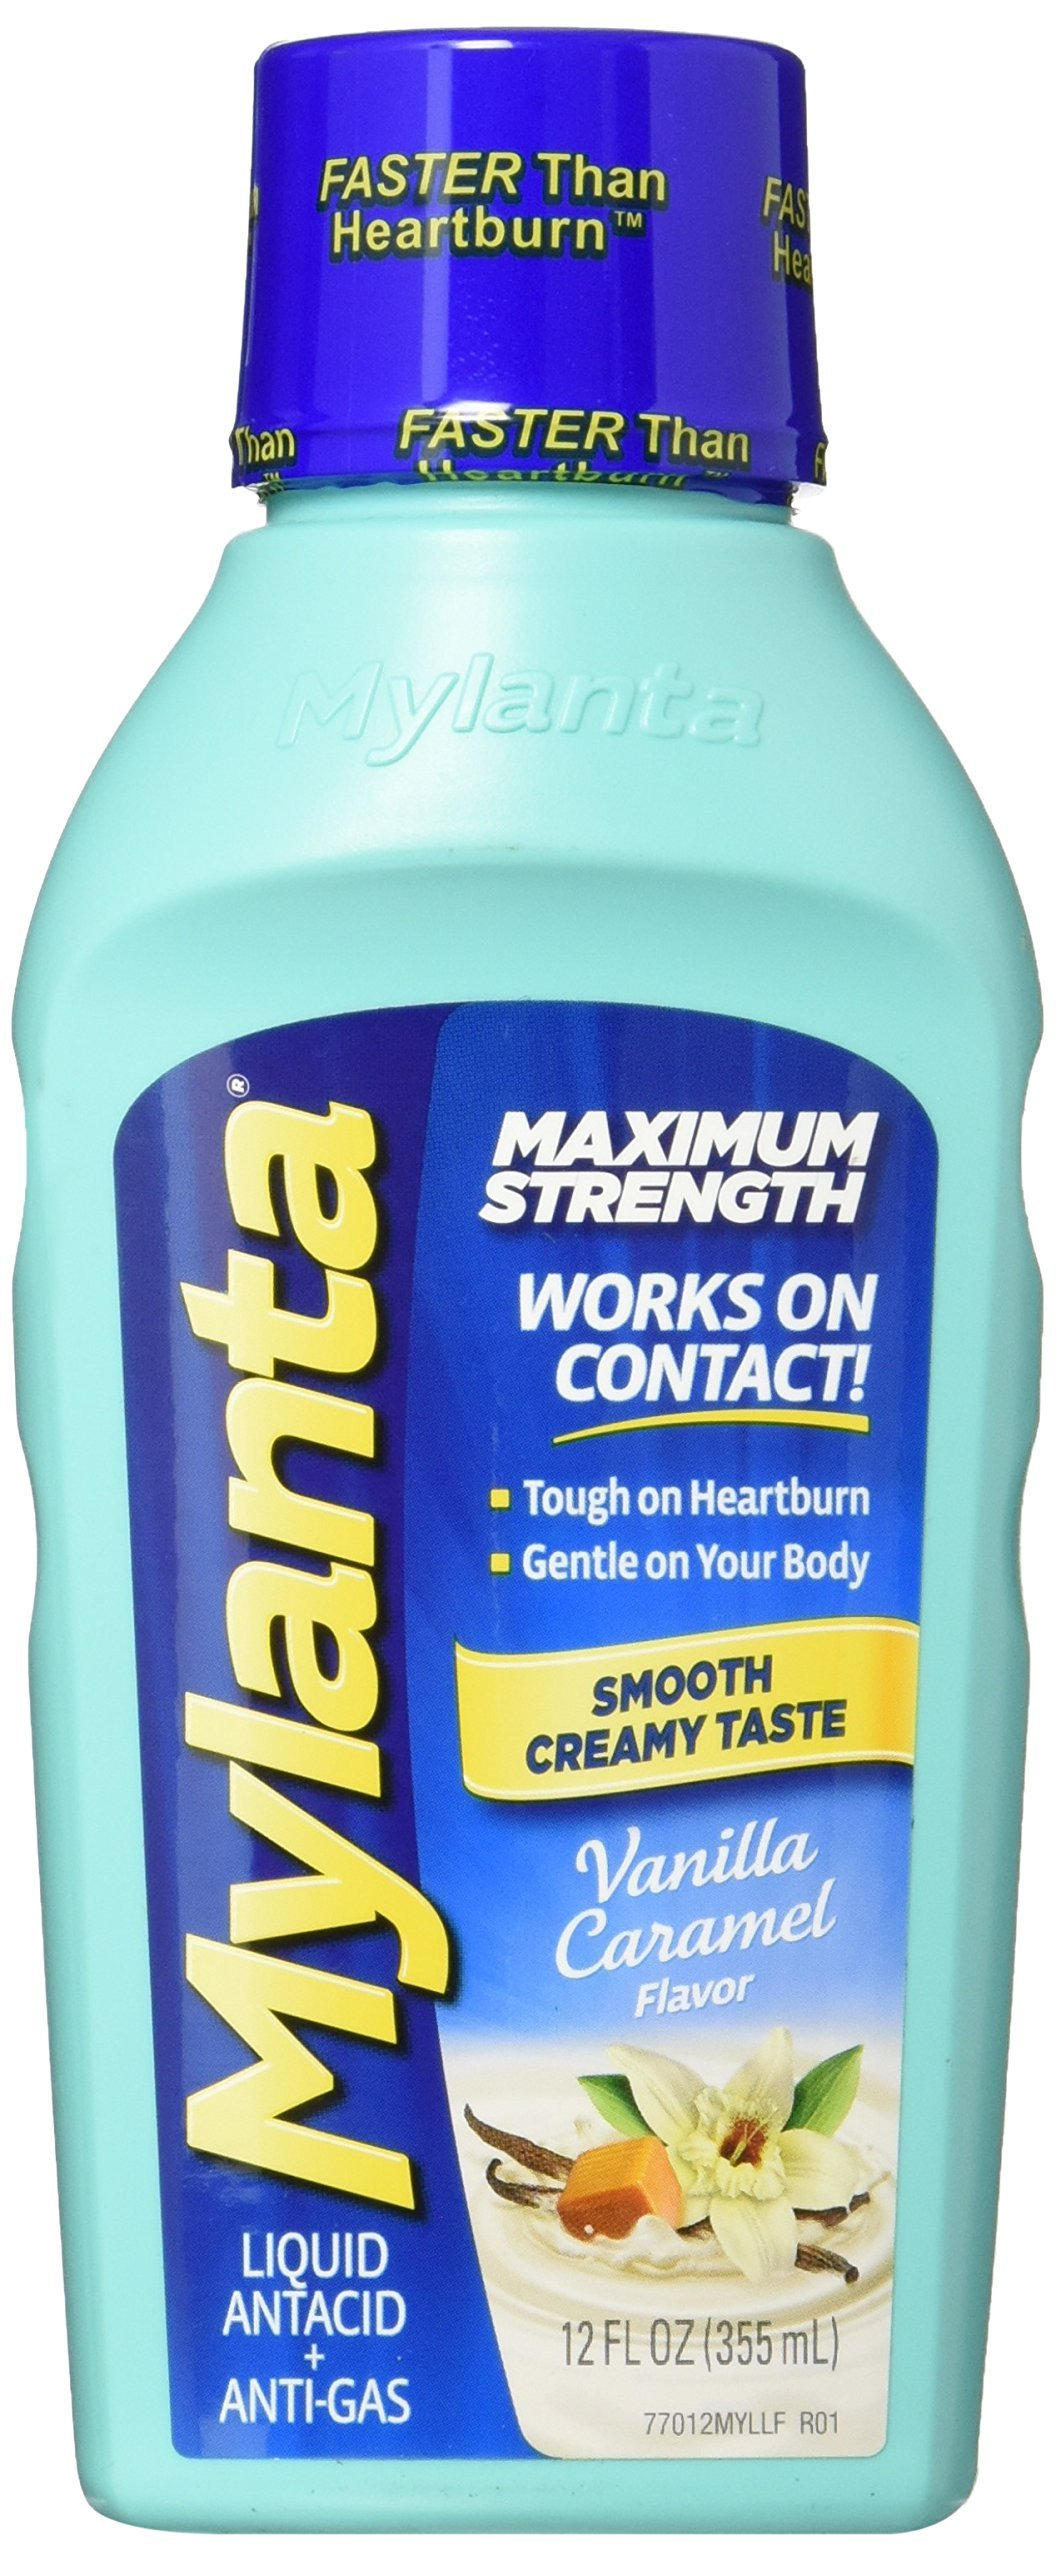 Amazon.com: Mylanta Antacid and Gas Relief, Maximum Strength Formula, Vanilla Flavor, 12 Fluid Ounce: Health & Personal Care